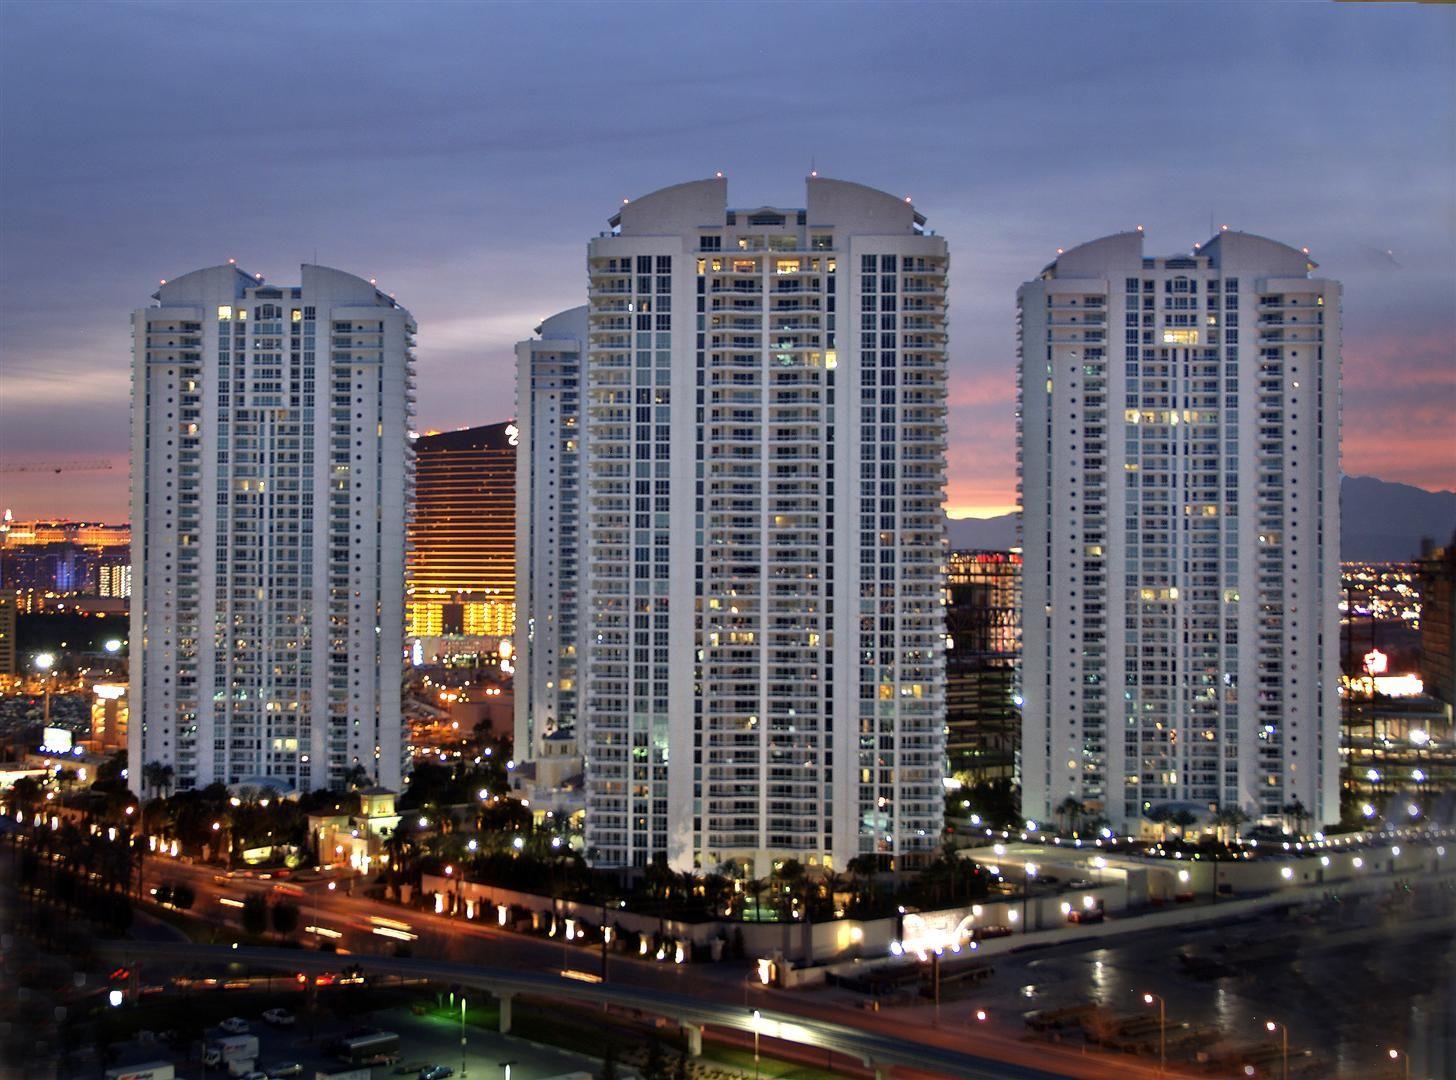 Dentist In Las Vegas Las Vegas Condos Penthouse For Sale Las Vegas Real Estate